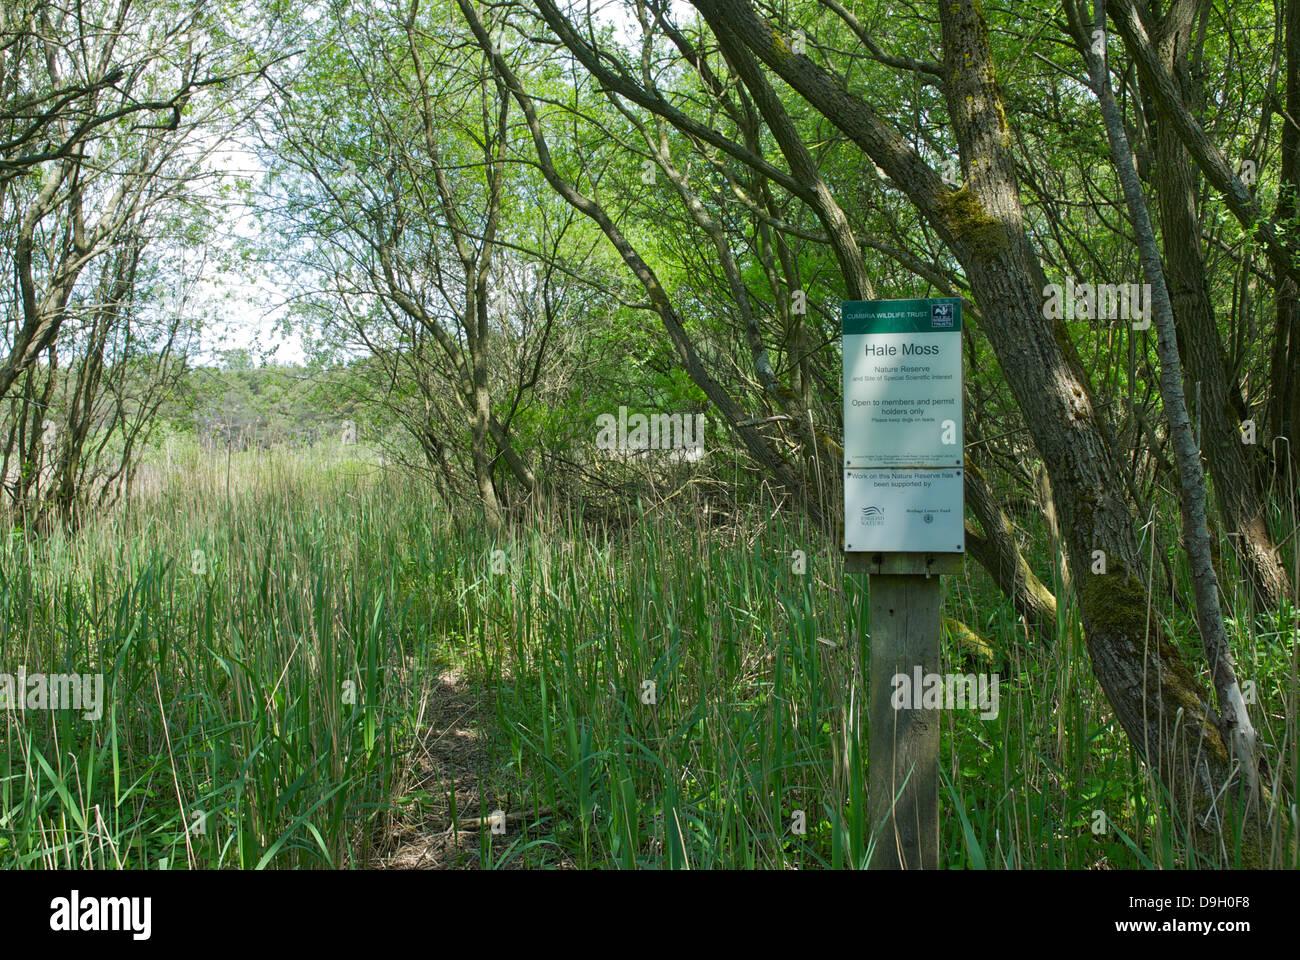 Sign at Hale Moss, a Cumbria Wildlife Trust nature reserve near Burton-in-Kendal, Cumbria, England UK - Stock Image